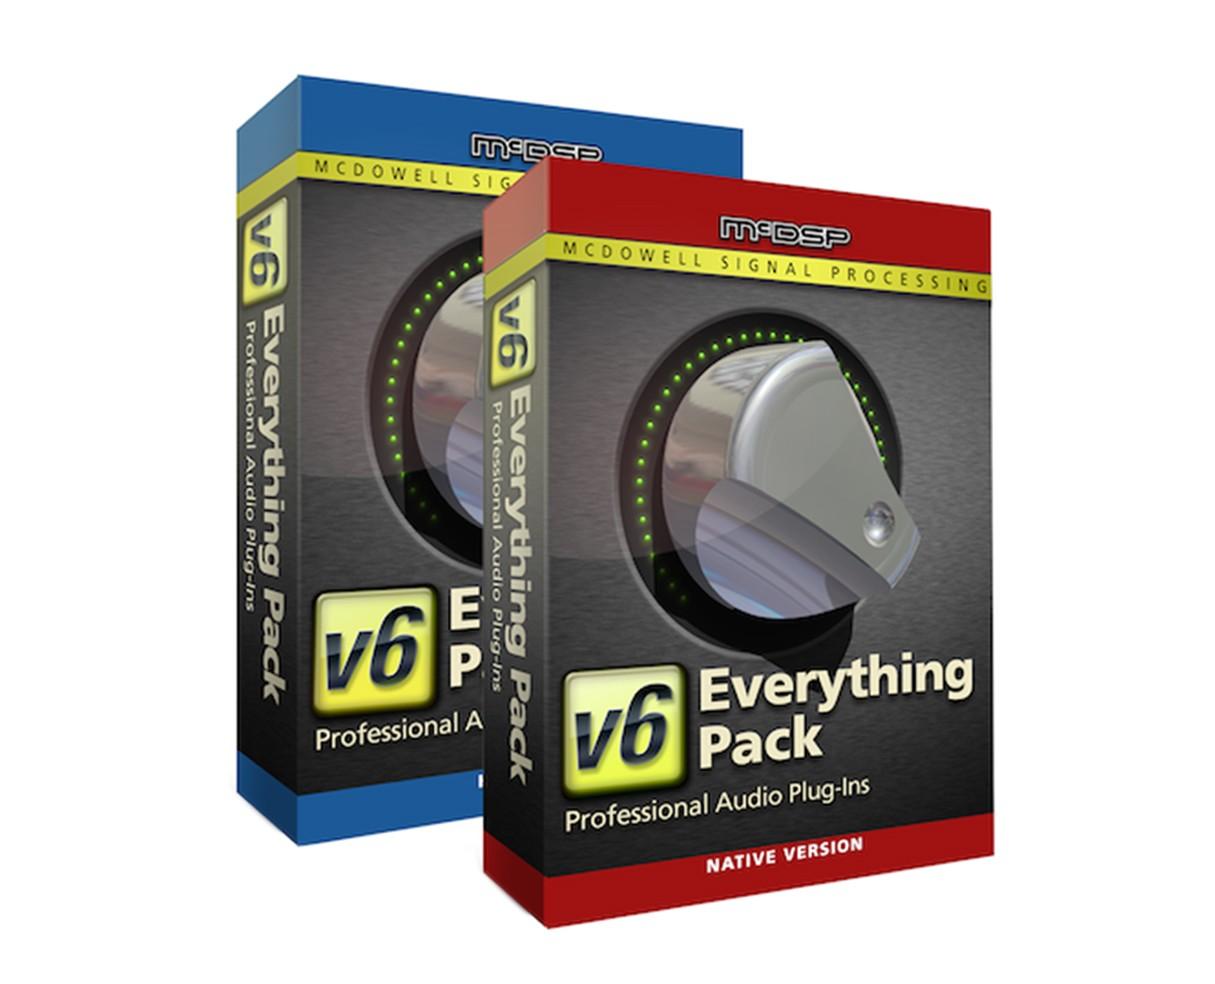 McDSP Plugins Everything Pack Nat v6.4 (Proaudiostar.com)